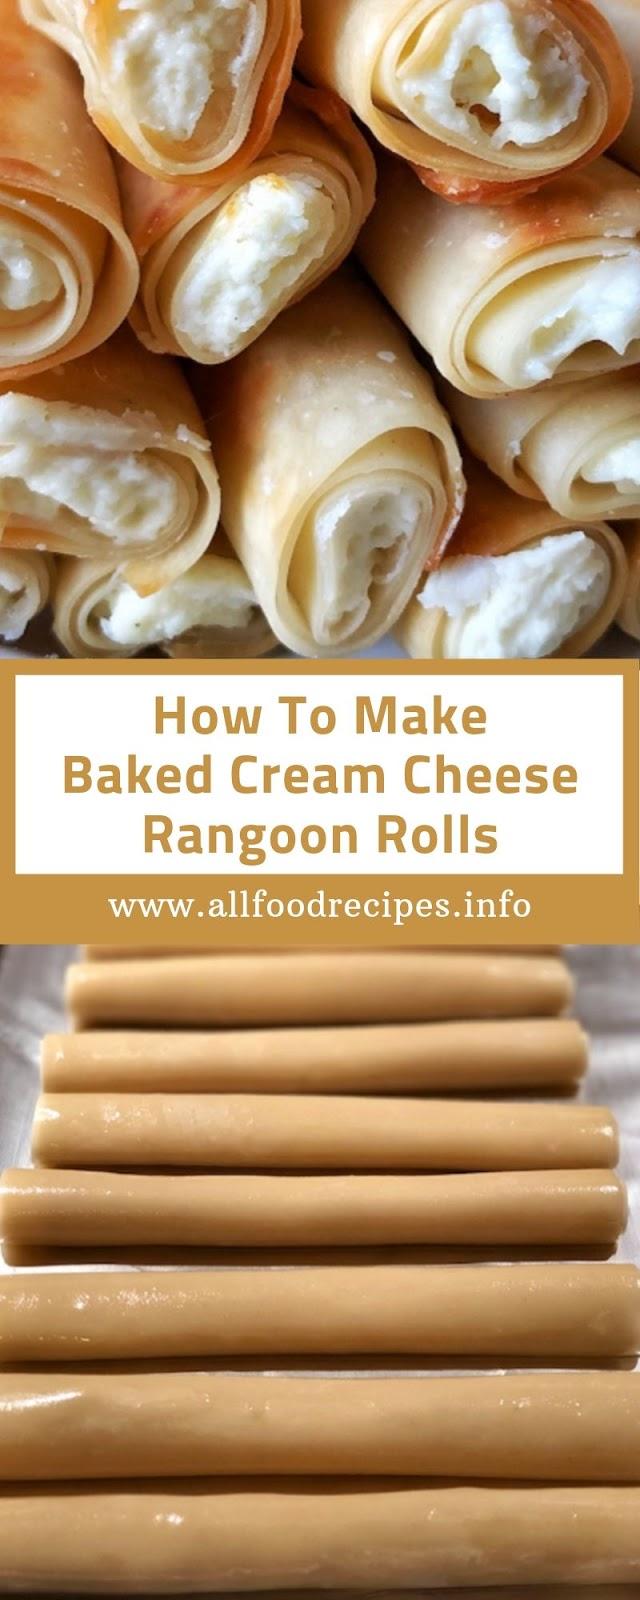 How To Make Baked Cream Cheese Rangoon Rolls